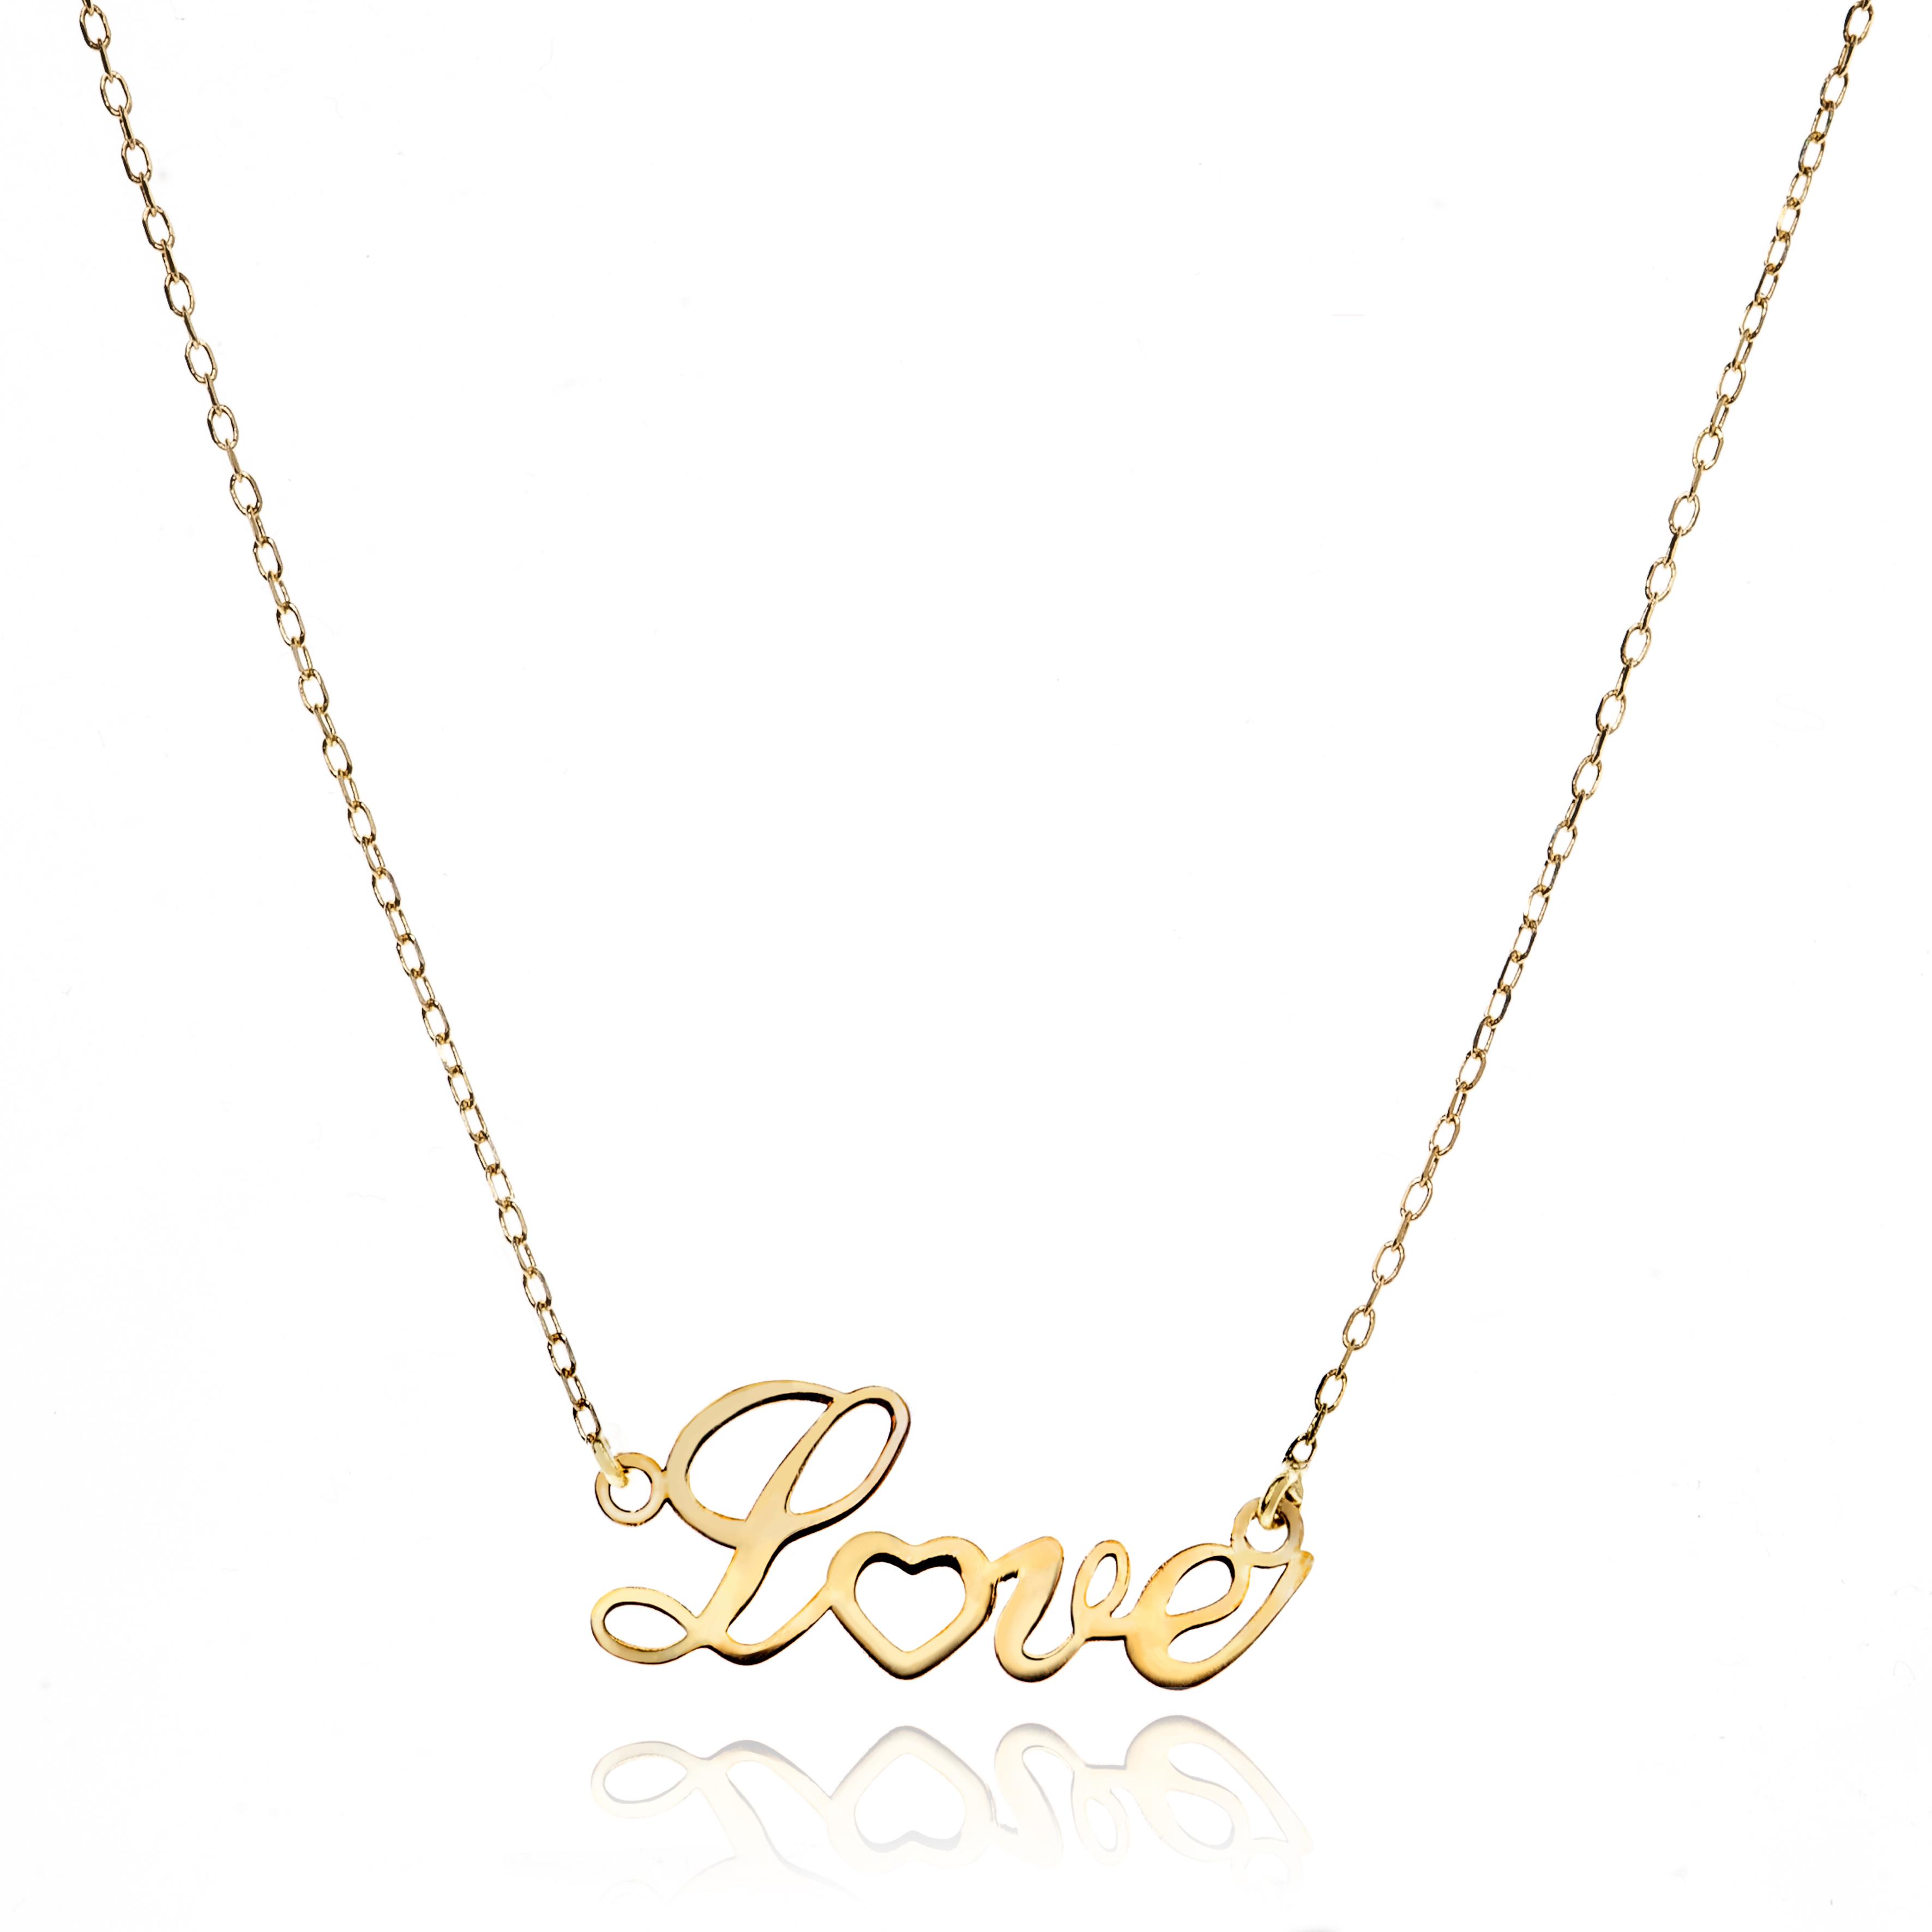 Colgante LOVE oro amarillo 18 quilates jolfer joyeros 0544726